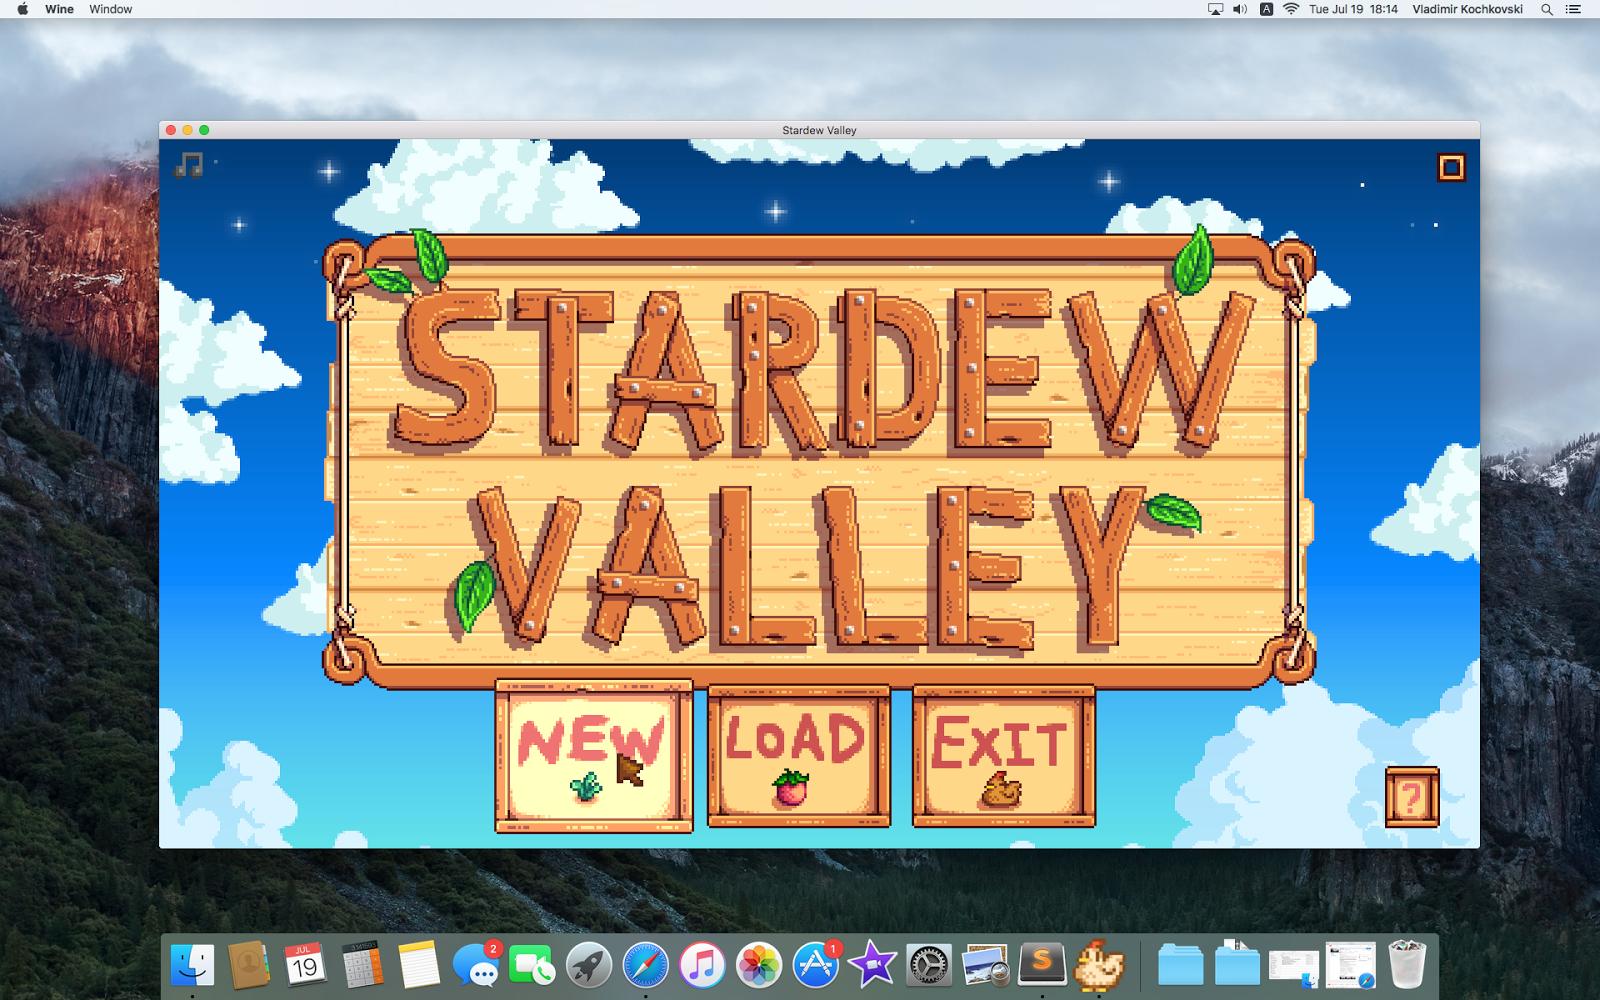 GetVladimir com: How to run Stardew Valley on a Mac